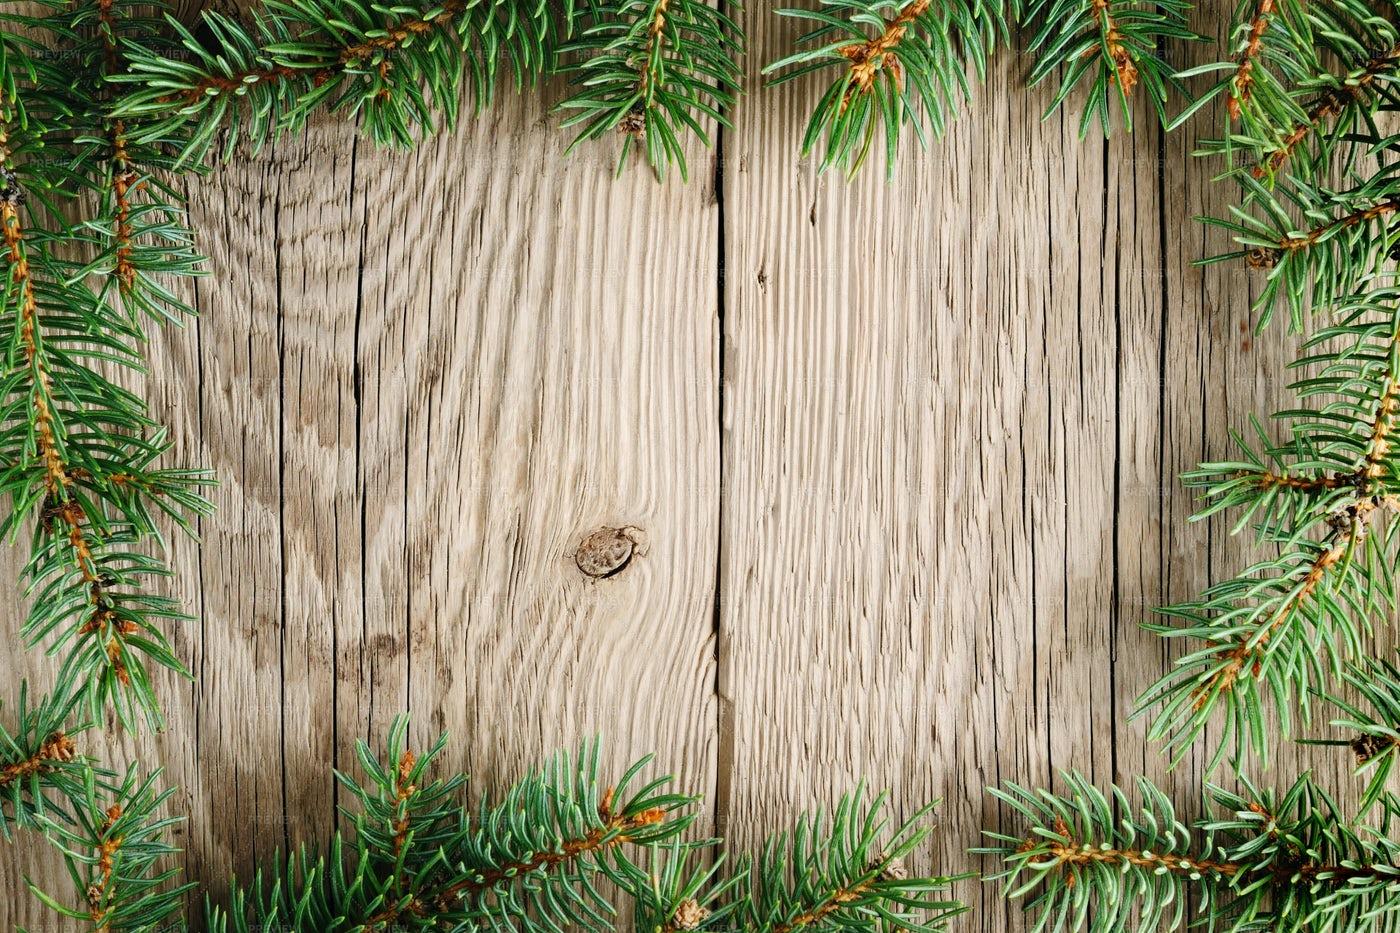 Frame Of Christmas Branches: Stock Photos